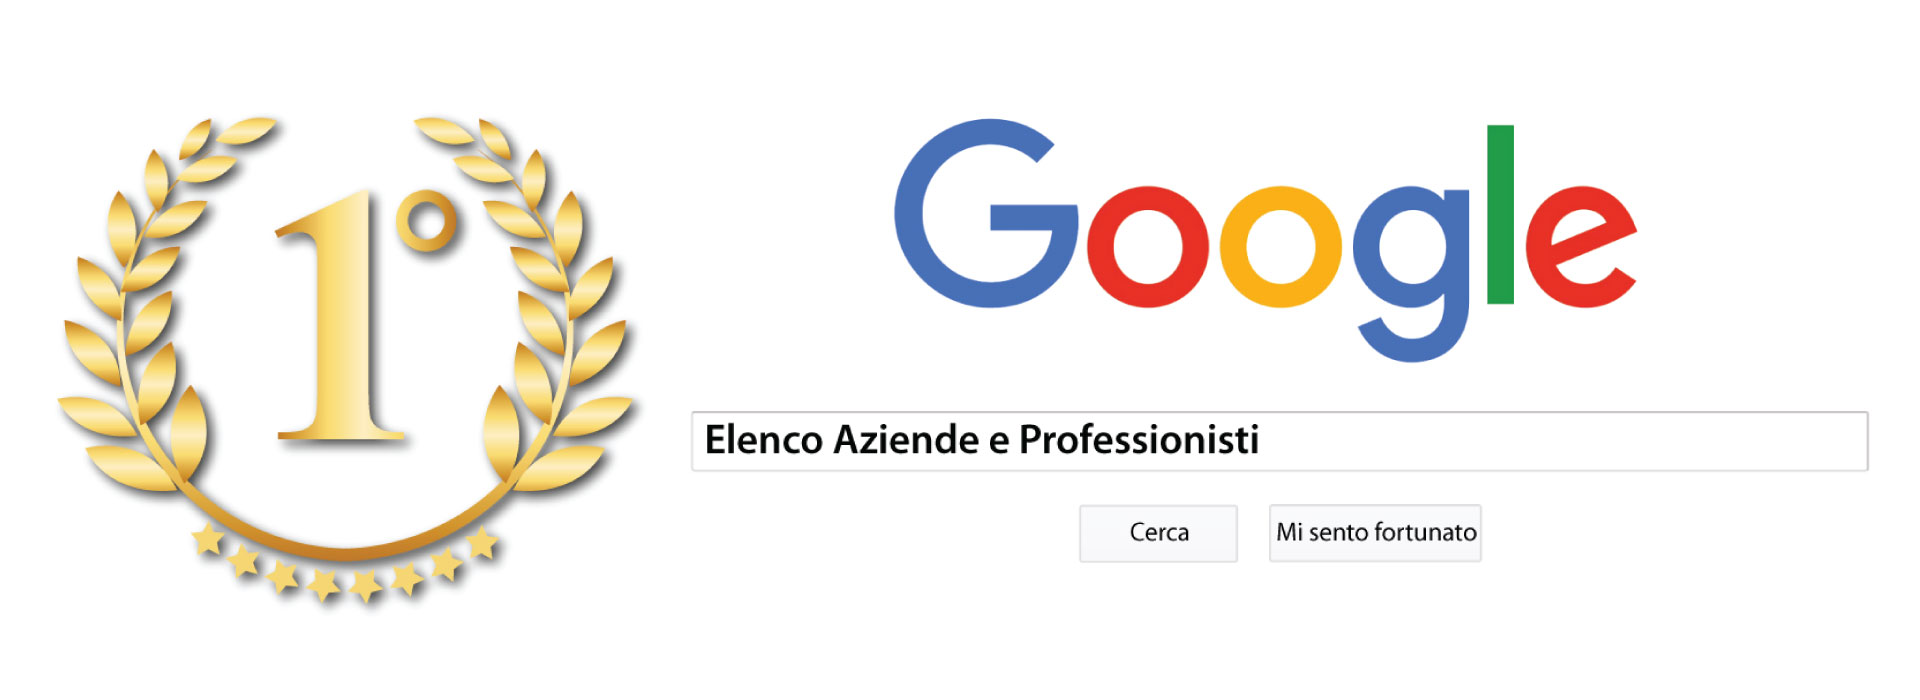 Sube a Google